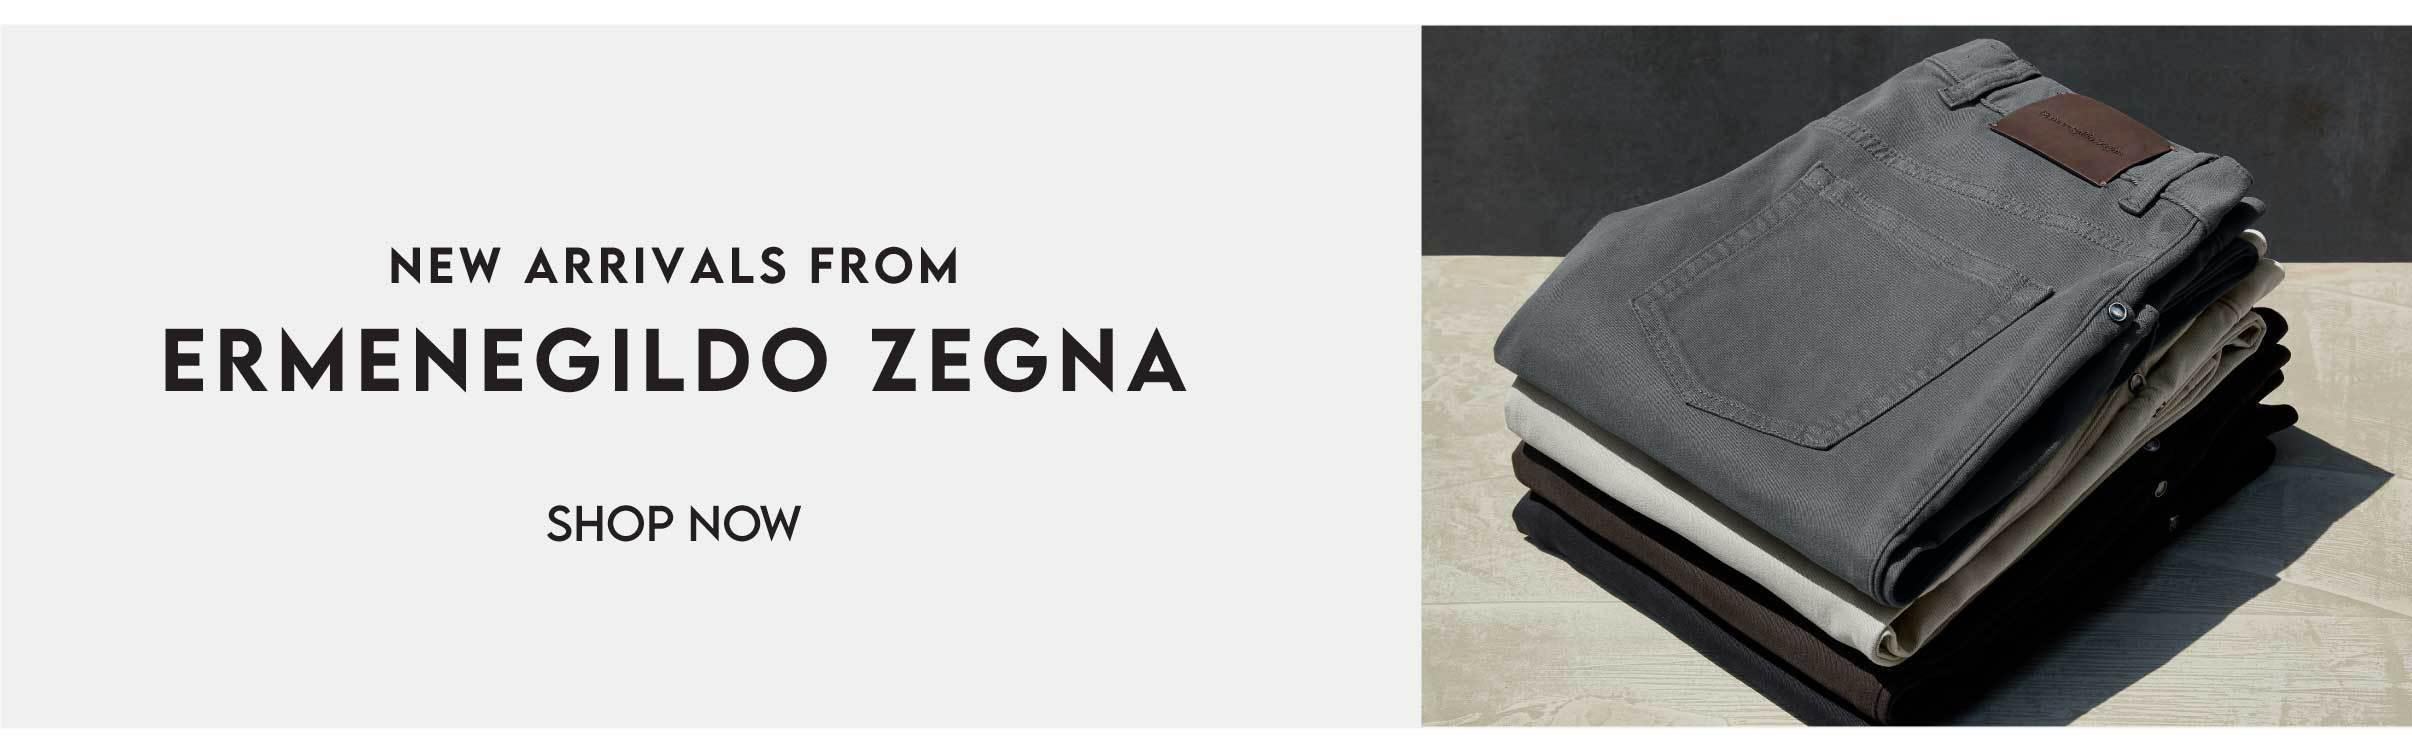 new arrivals from Ermenegildo Zegna